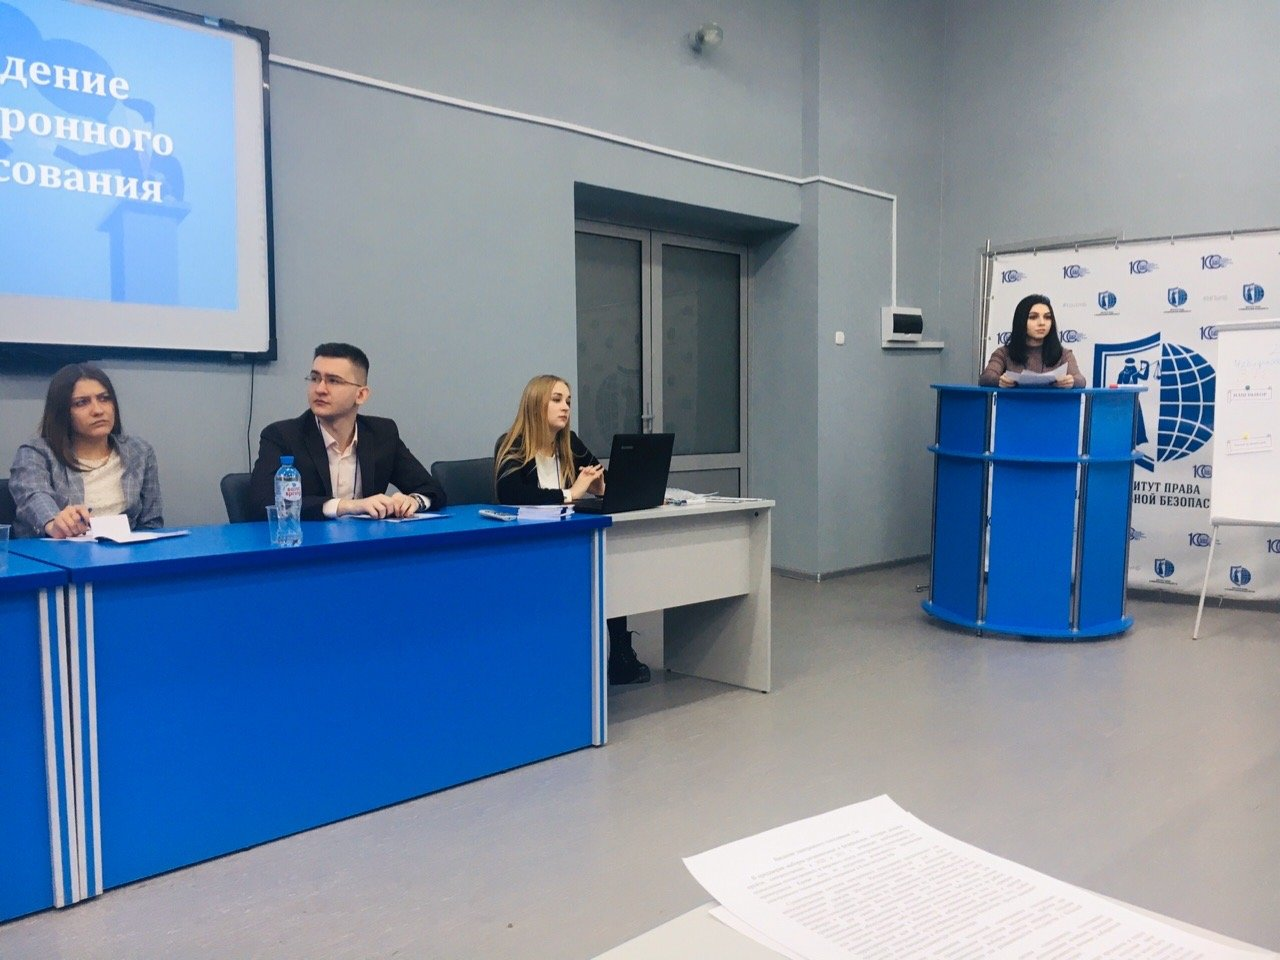 Команда Тамбовского филиала РАНХиГС заняла первое место в дебатах, фото-1